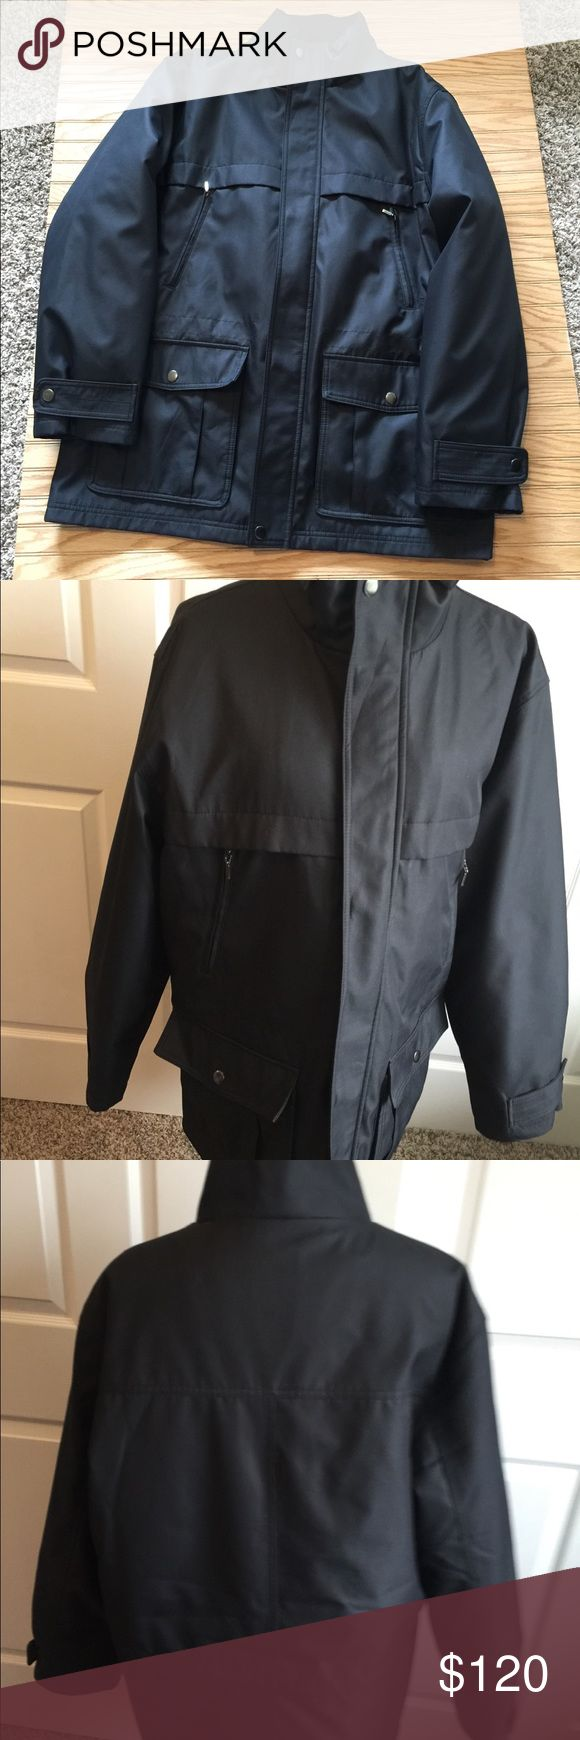 New Men's MK Black Lined Coat L Excellent clean condition authentic Michael Kors men's heavy coat with removable lining  Size large Michael Kors Jackets & Coats